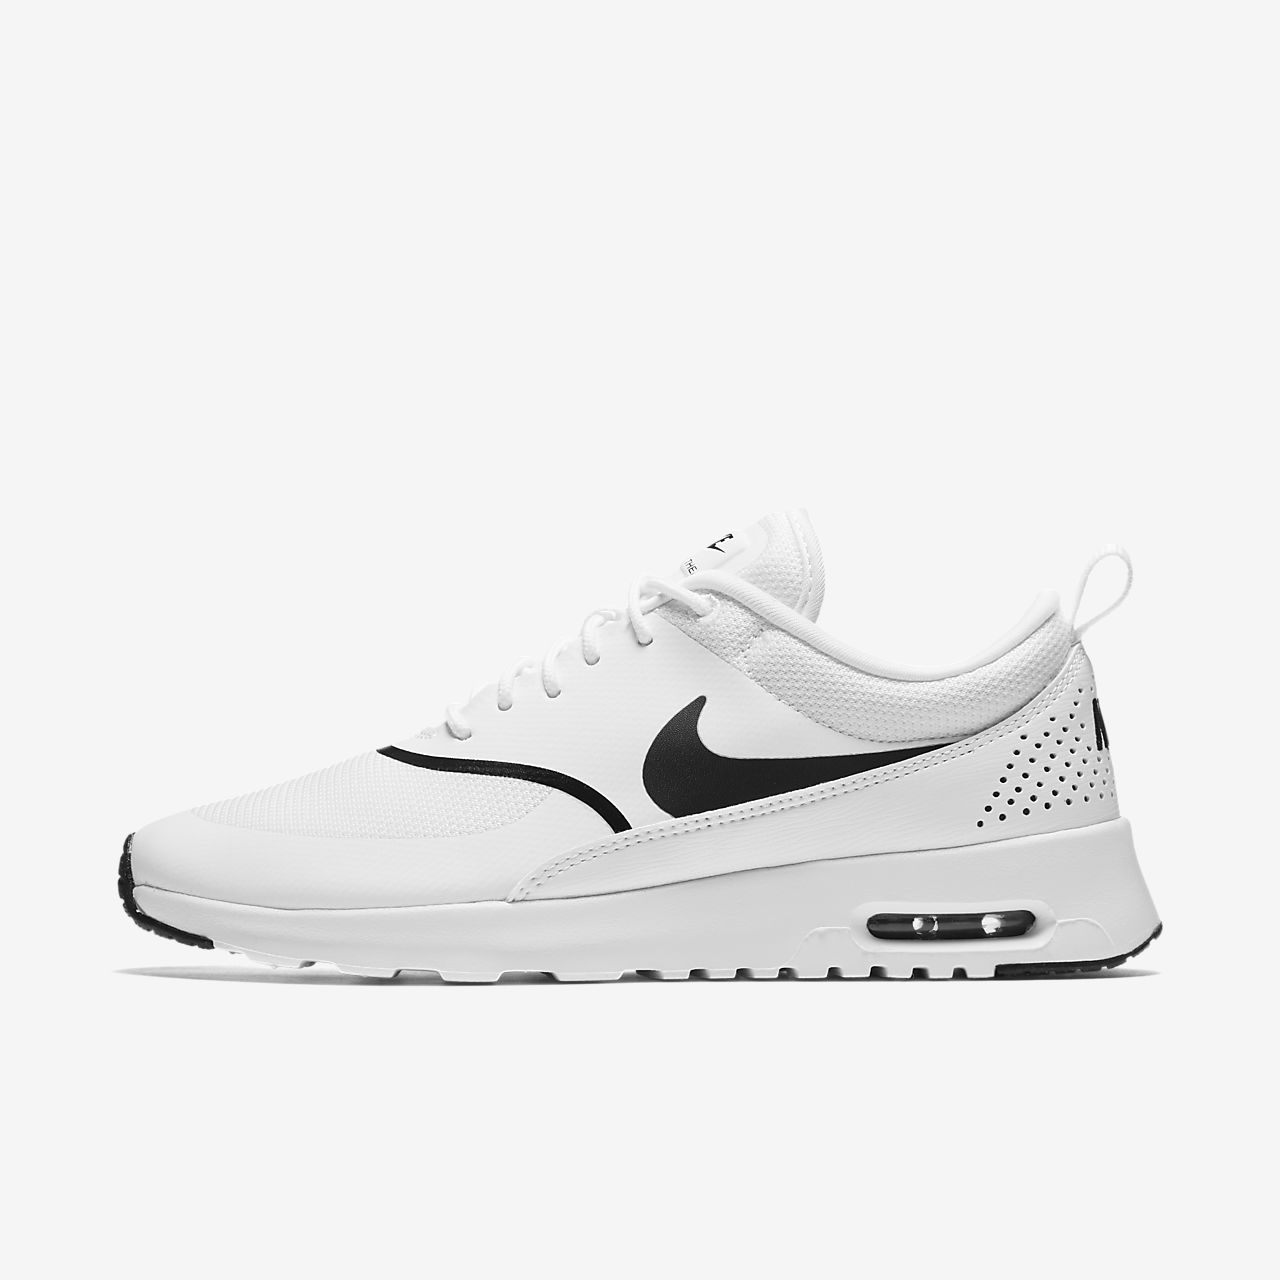 reputable site c00d8 1eaf5 ... Nike Air Max Thea Women s Shoe